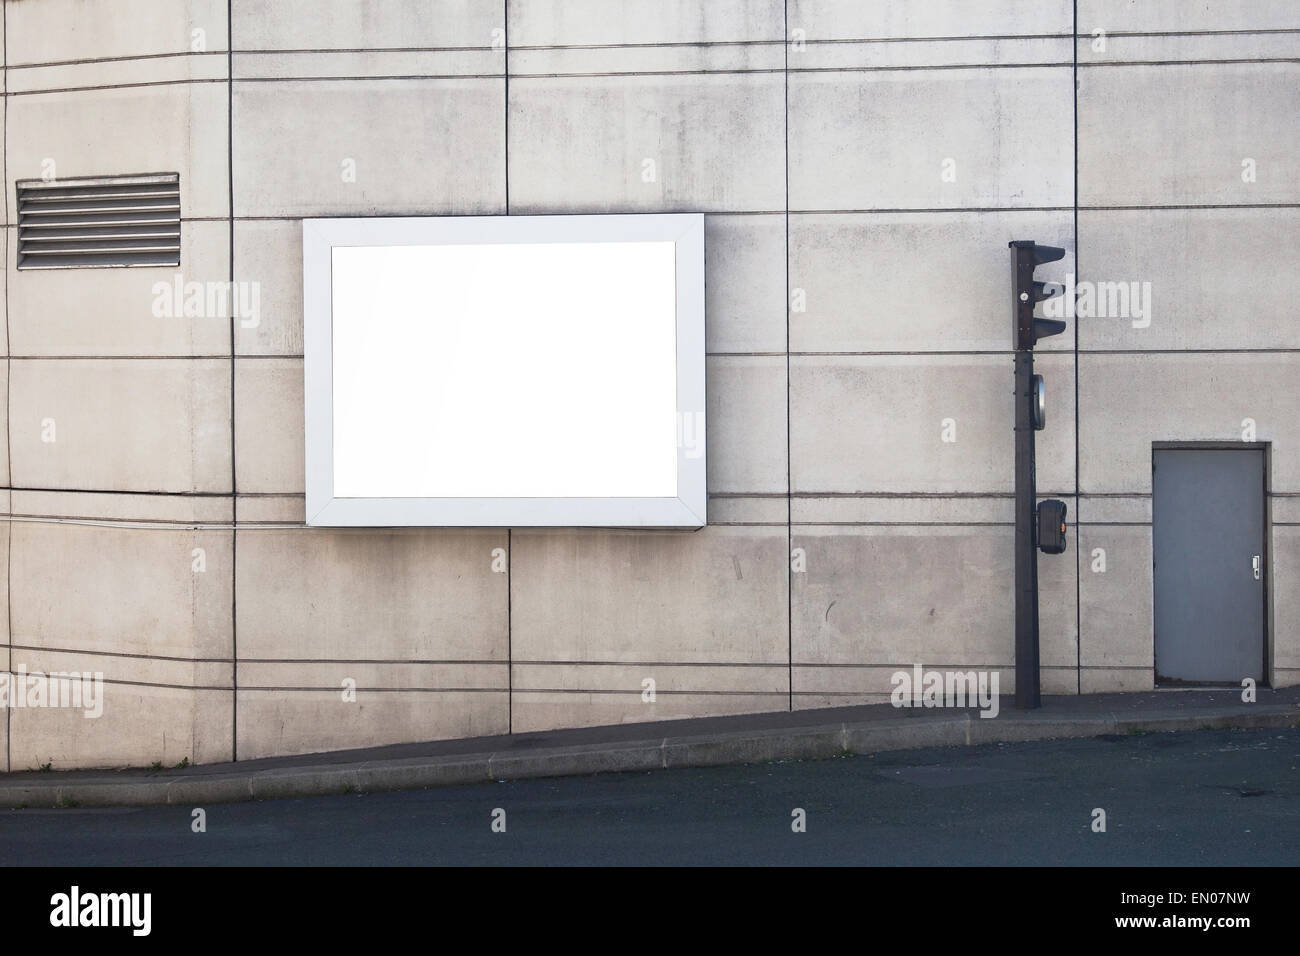 empty billboard in the city - Stock Image